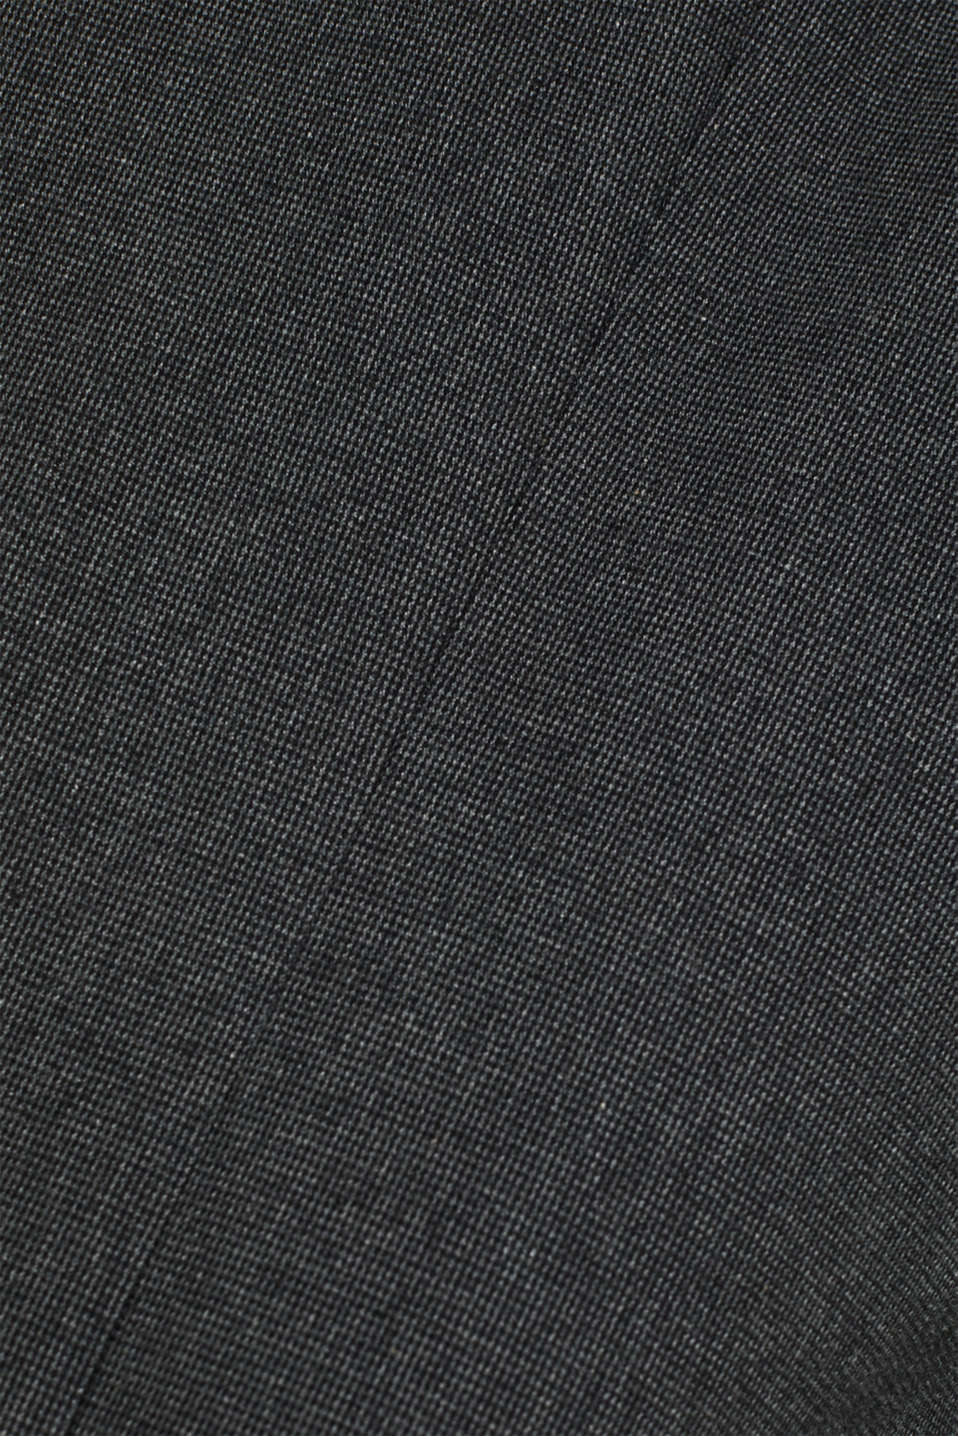 Tailored jacket made of blended cotton, DARK GREY 5, detail image number 4